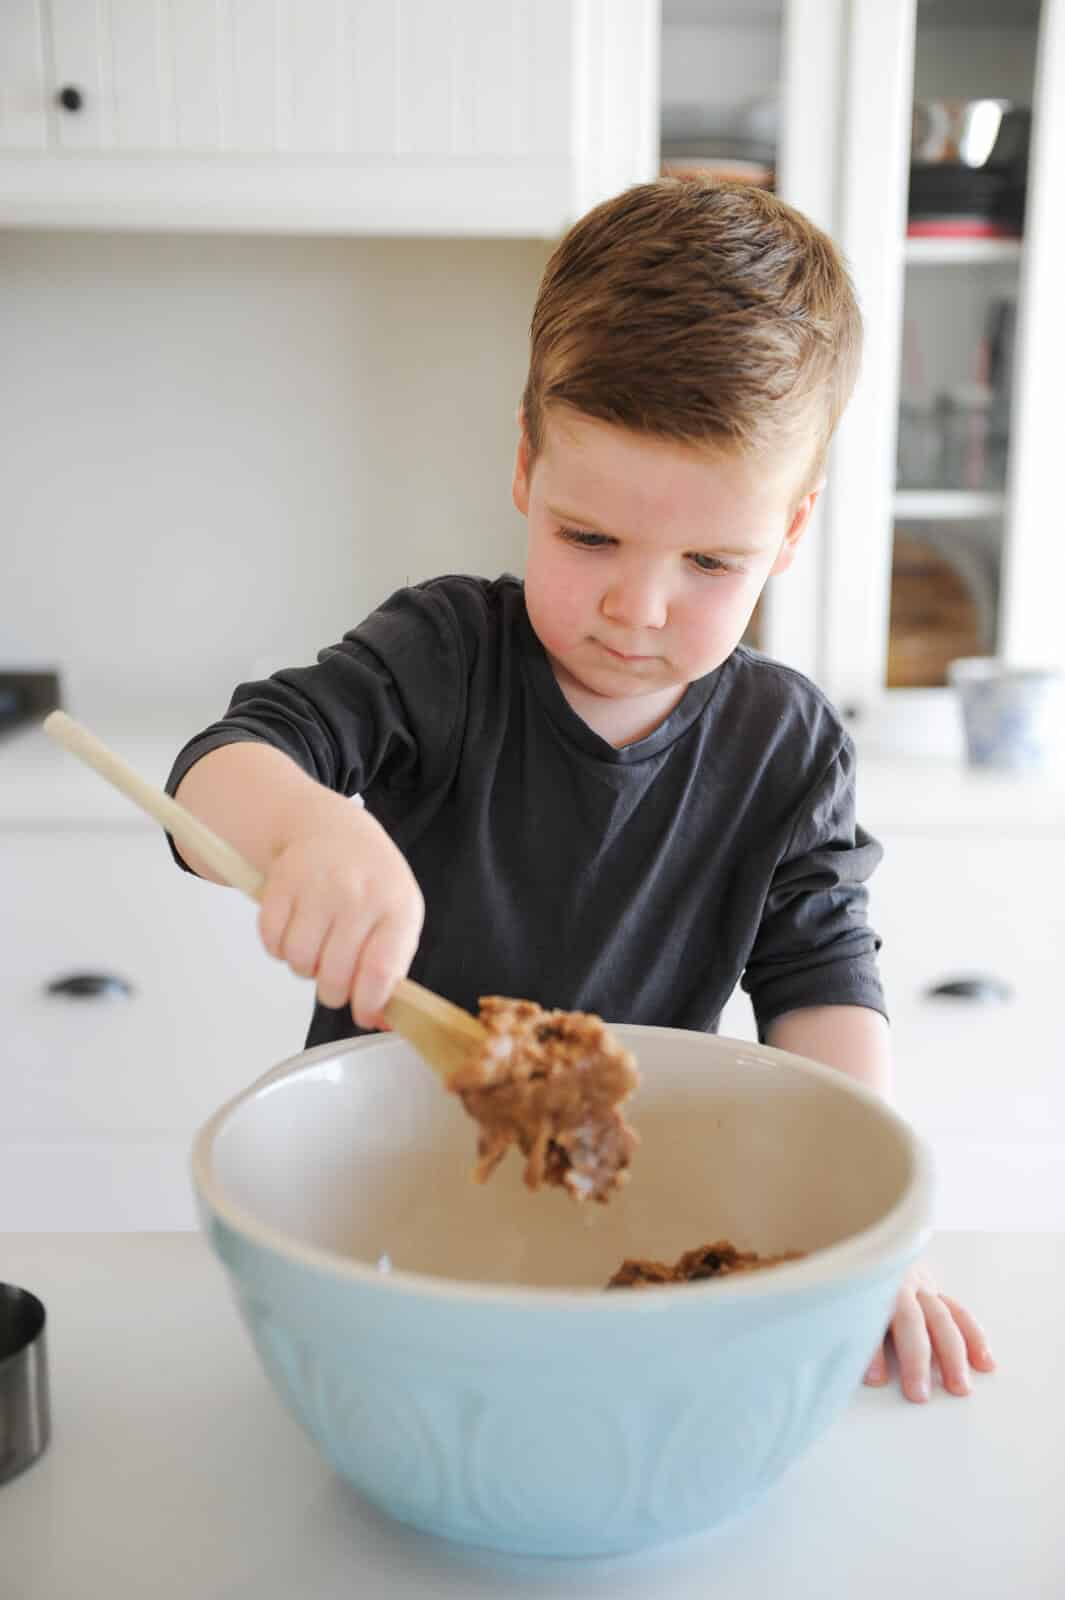 cooking-with-kids-boy-stirring-mixing